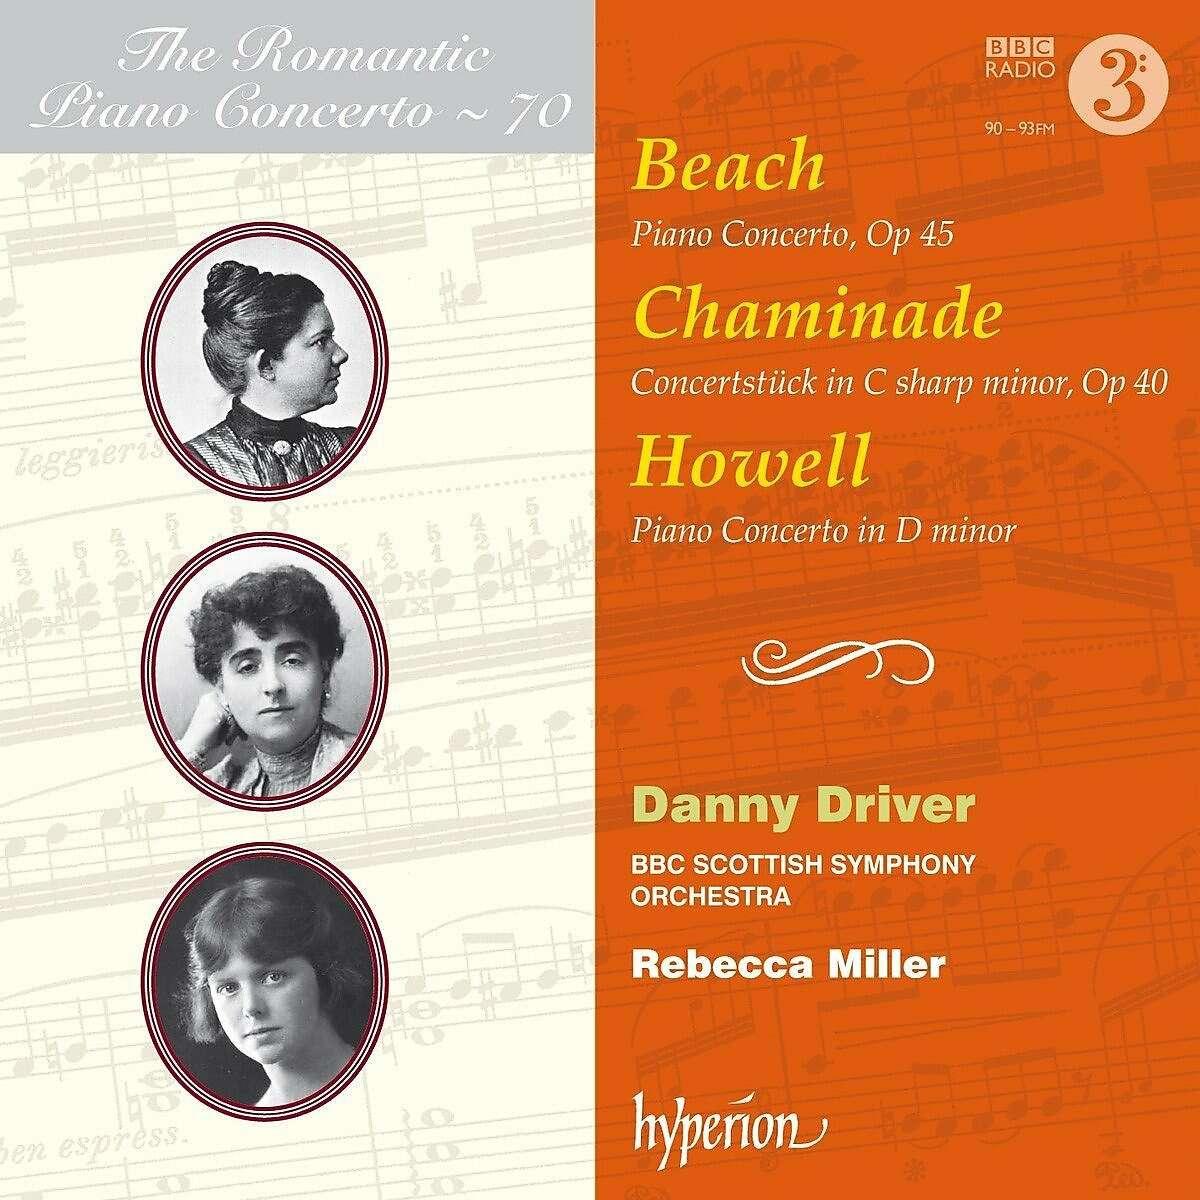 Beach, Chaminade, Howell: Piano Concertos